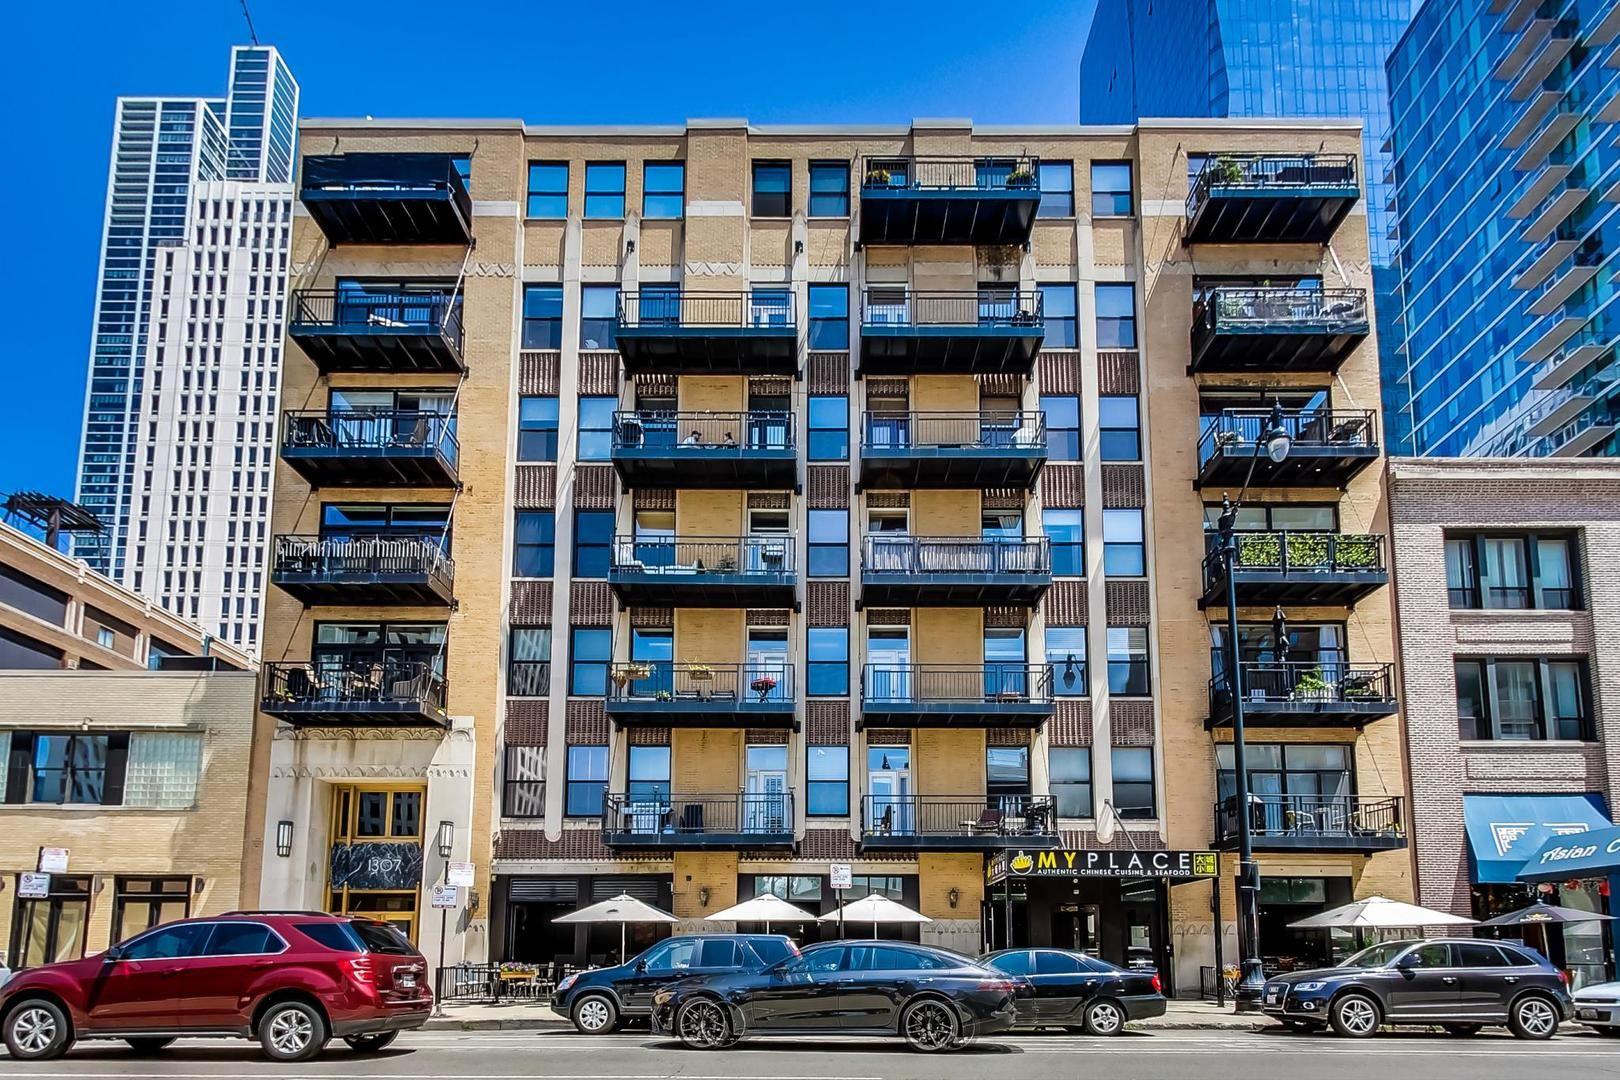 1307 S WABASH Street #311, Chicago, IL 60605 - #: 10798678